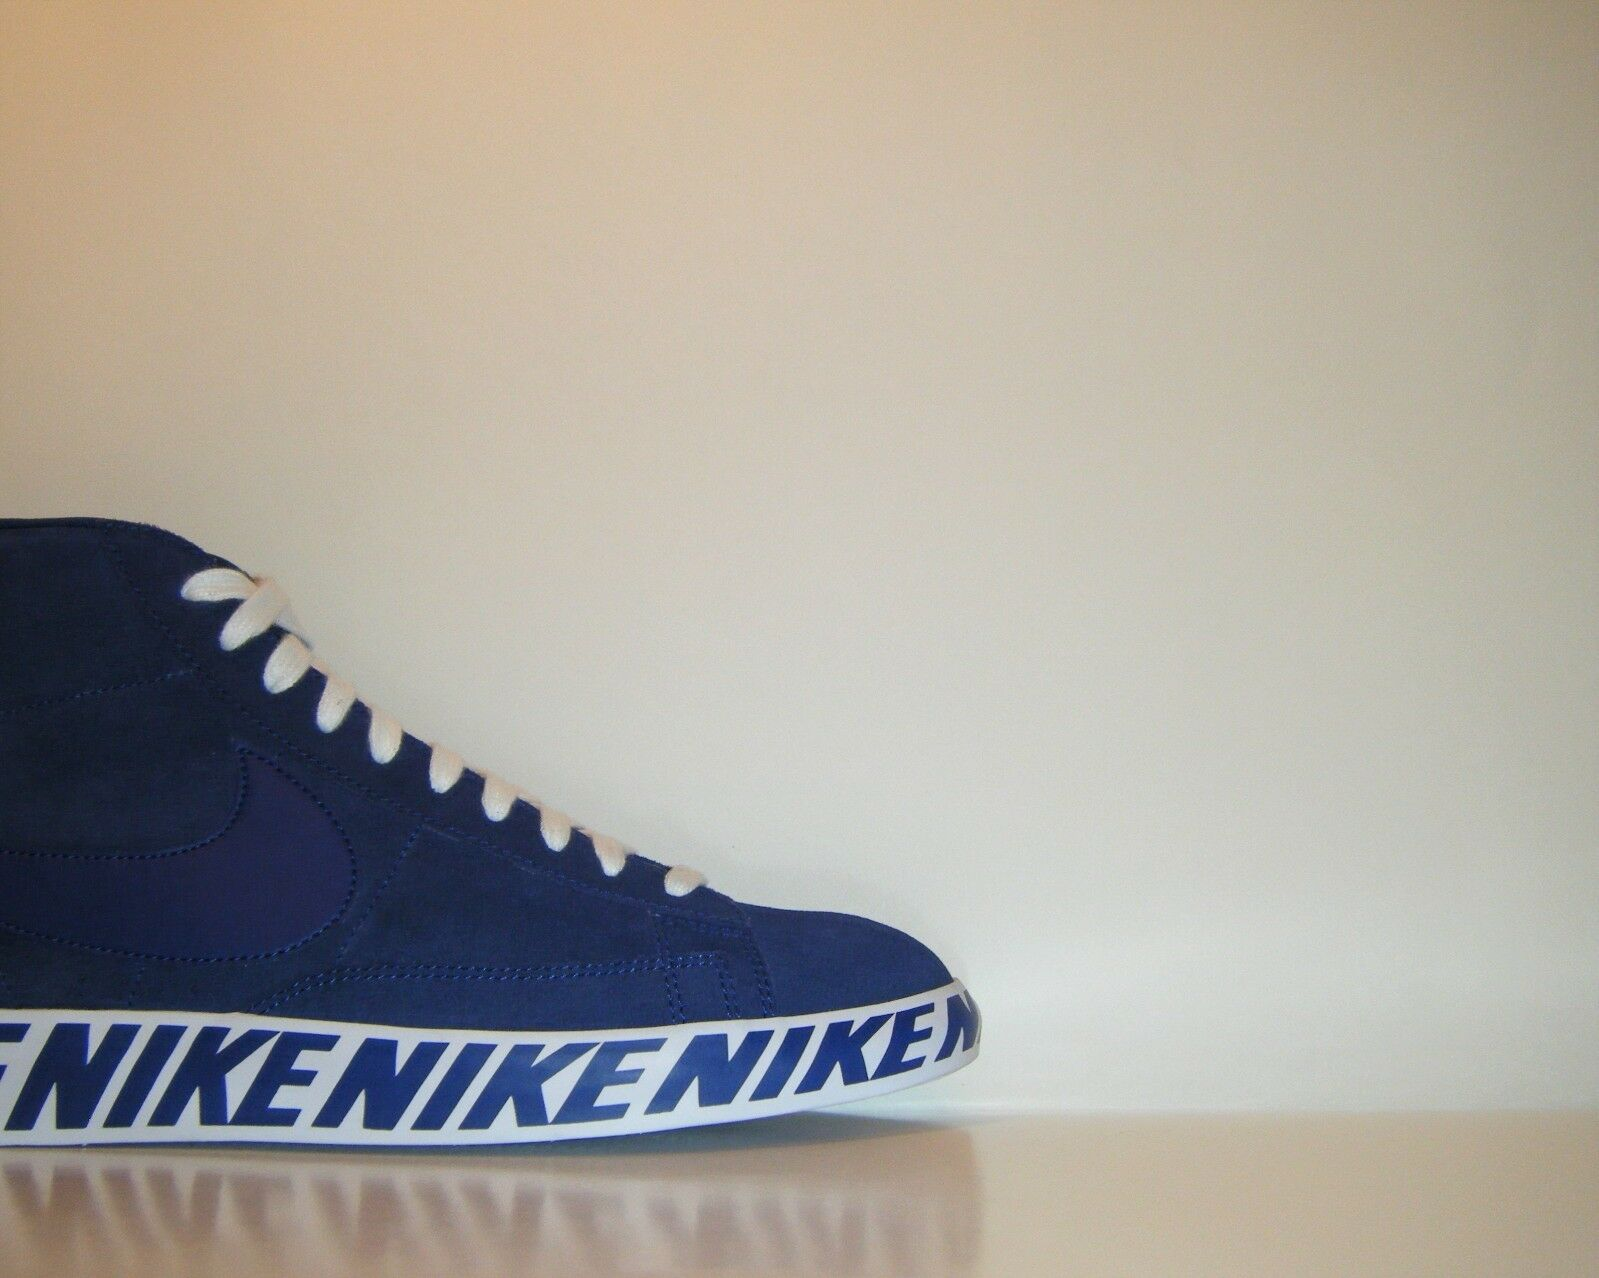 2017 Nike Blazer Mid Supreme Promo Sample Sz. 9 SB NikeLab bluee White PE Off OG